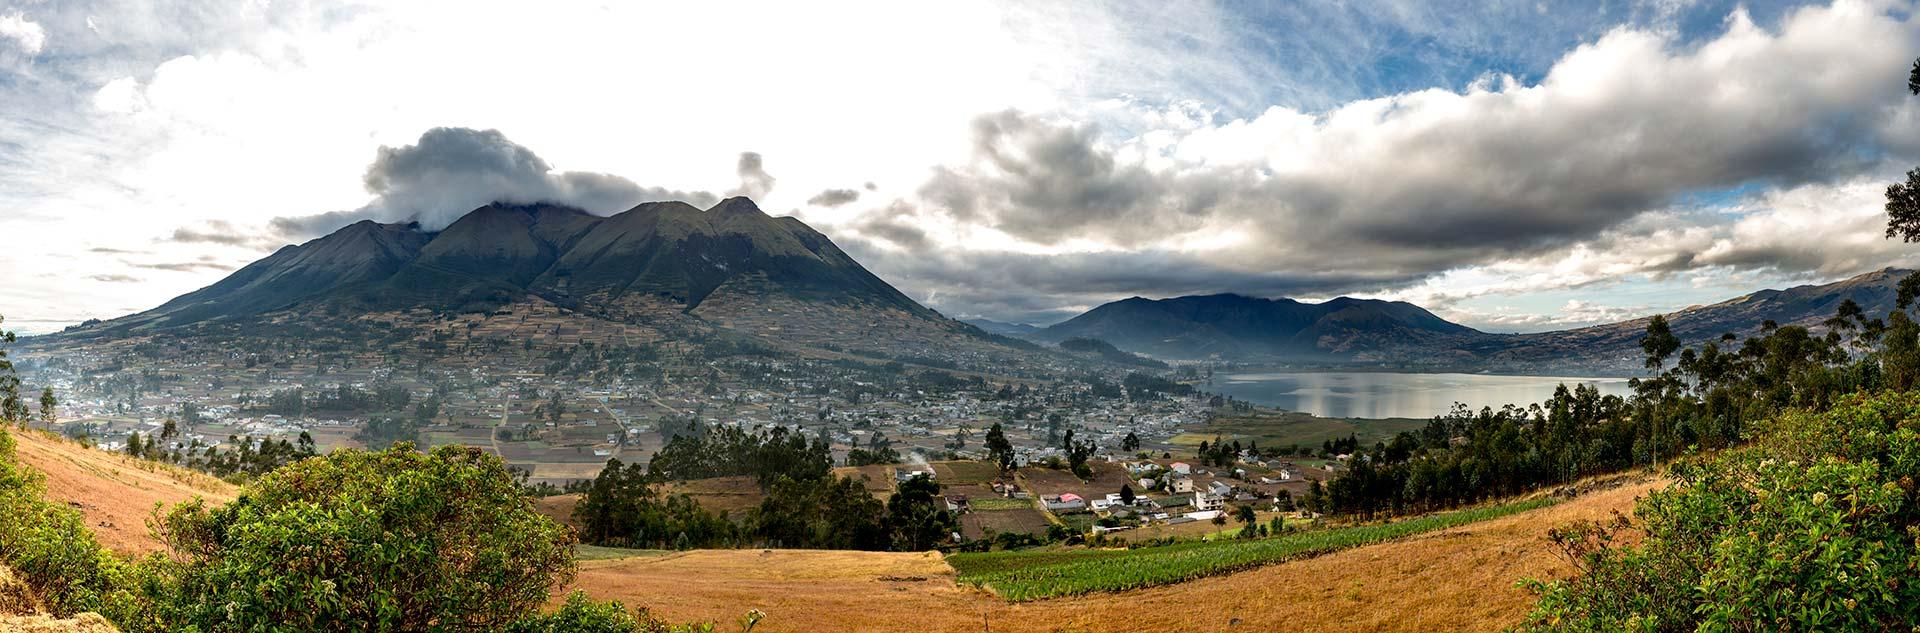 views of Otavalo and San Pablo Lake in Imbabura - Ecuador